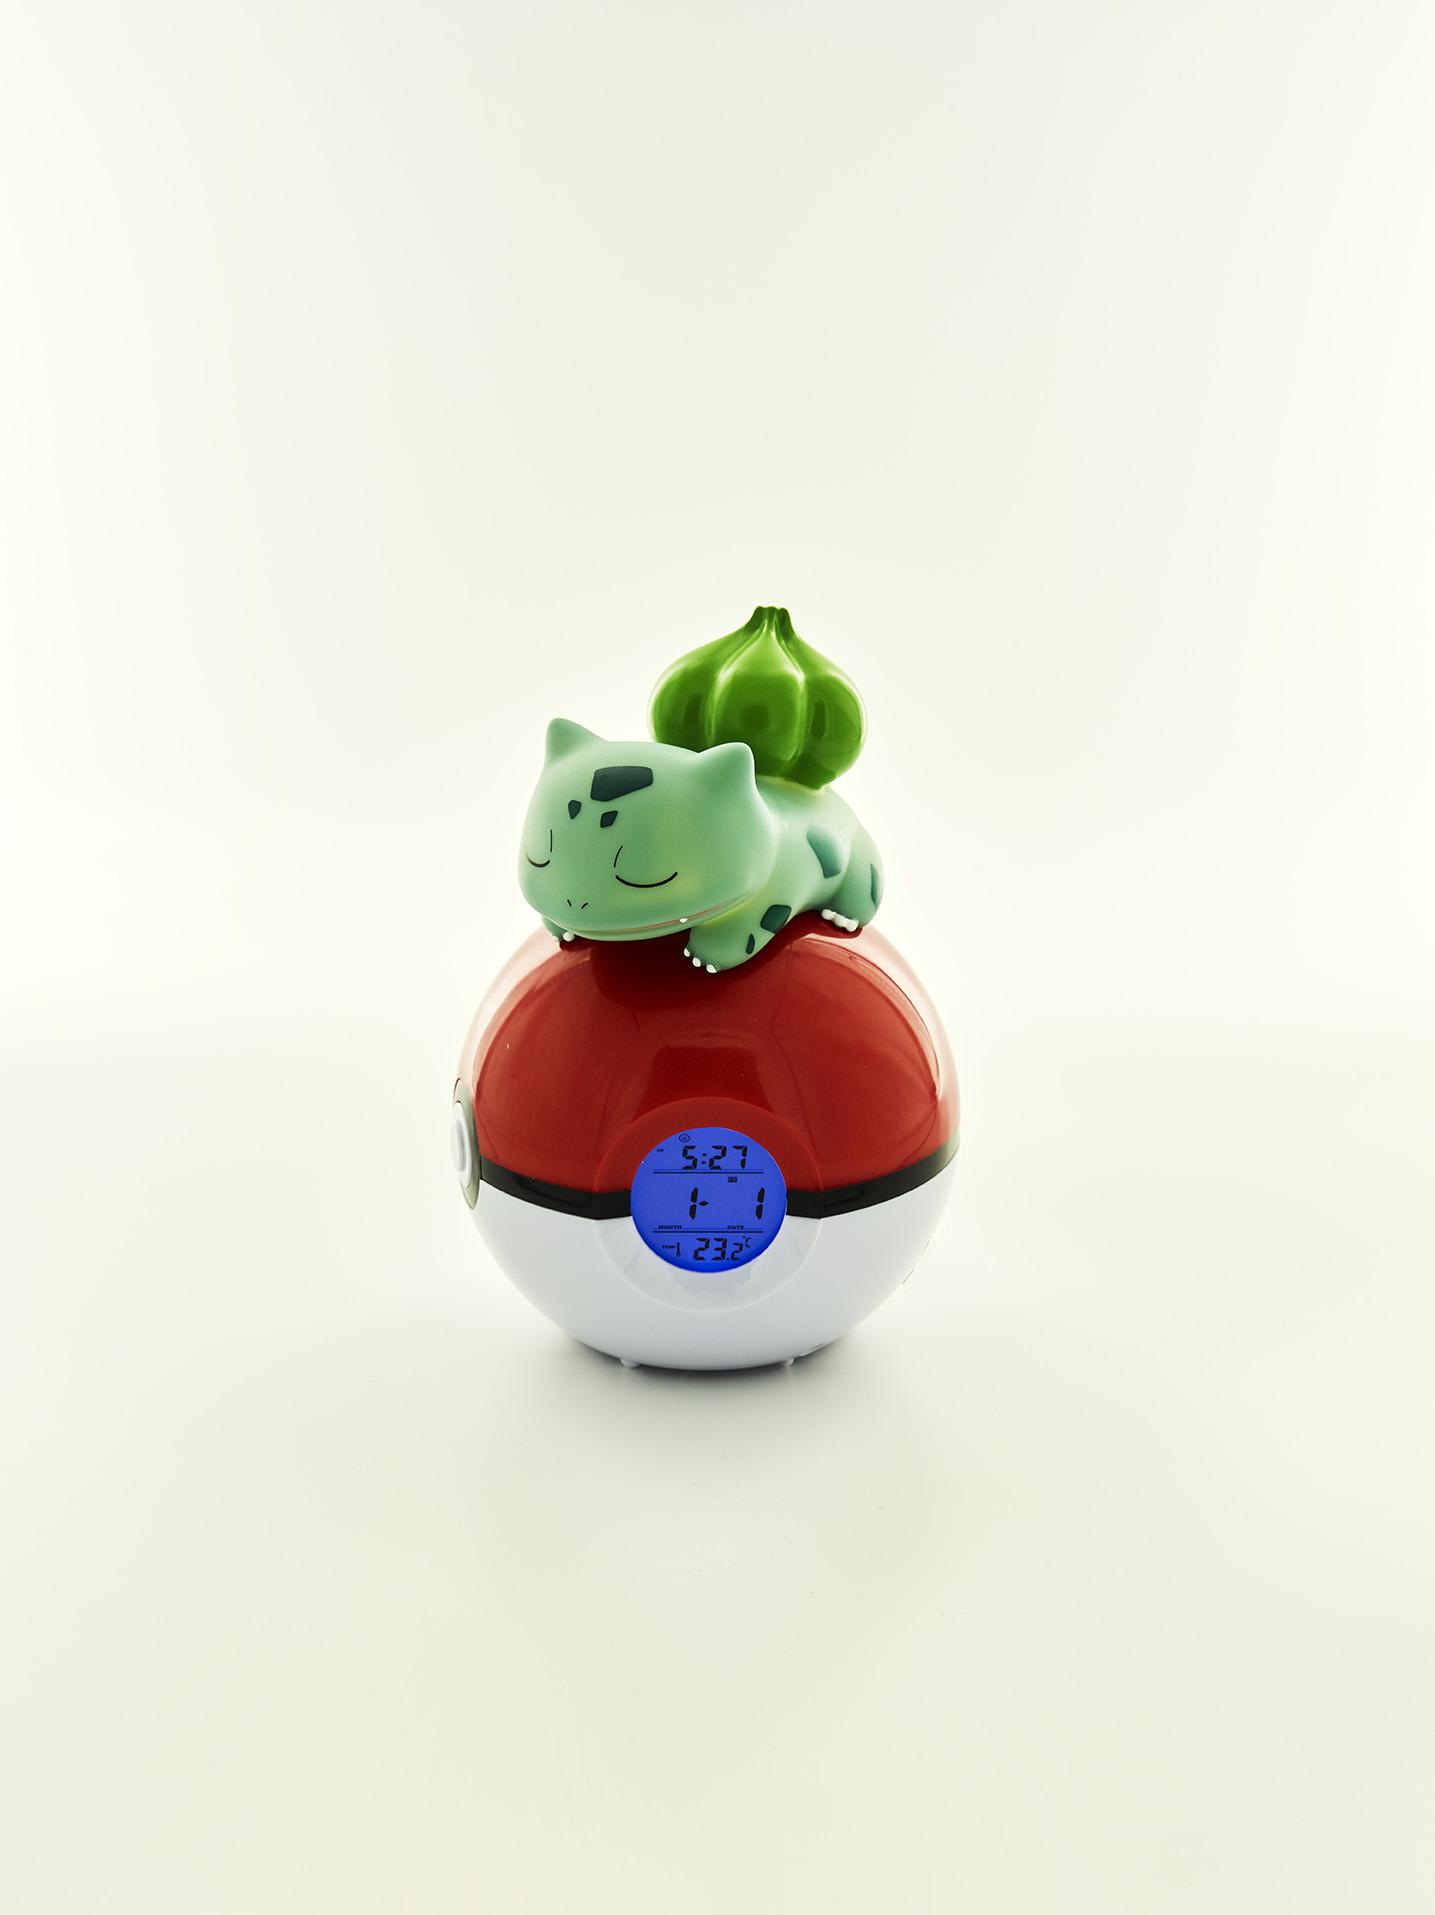 Pokémon Bulbasaur Night light and Alarm Clock 1